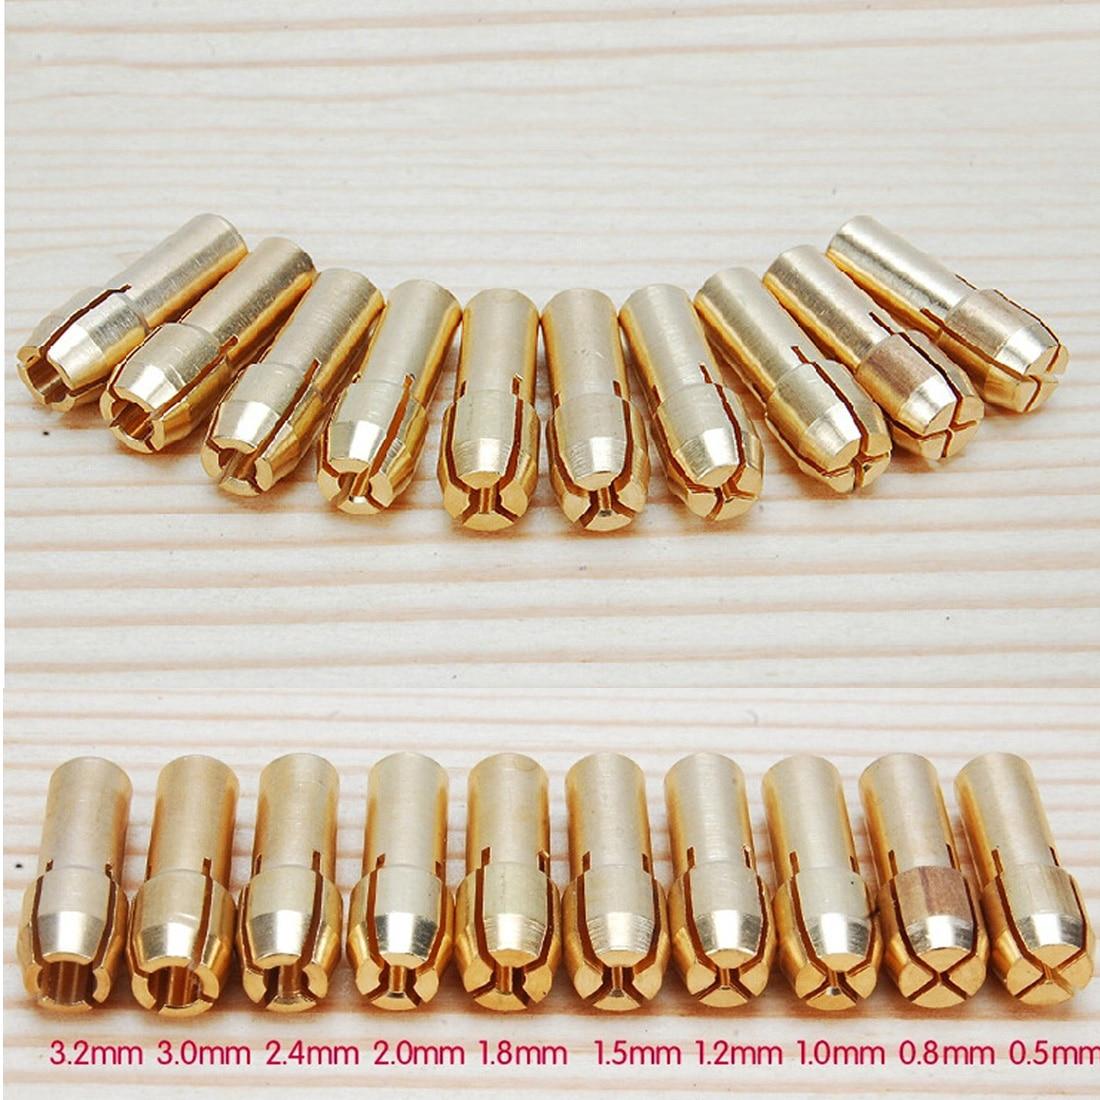 High Quality 10Pcs /set Brass Drill Chucks Collet Bits 0.5-3.2mm 4.3mm Shank For Dremel Rotary Tool